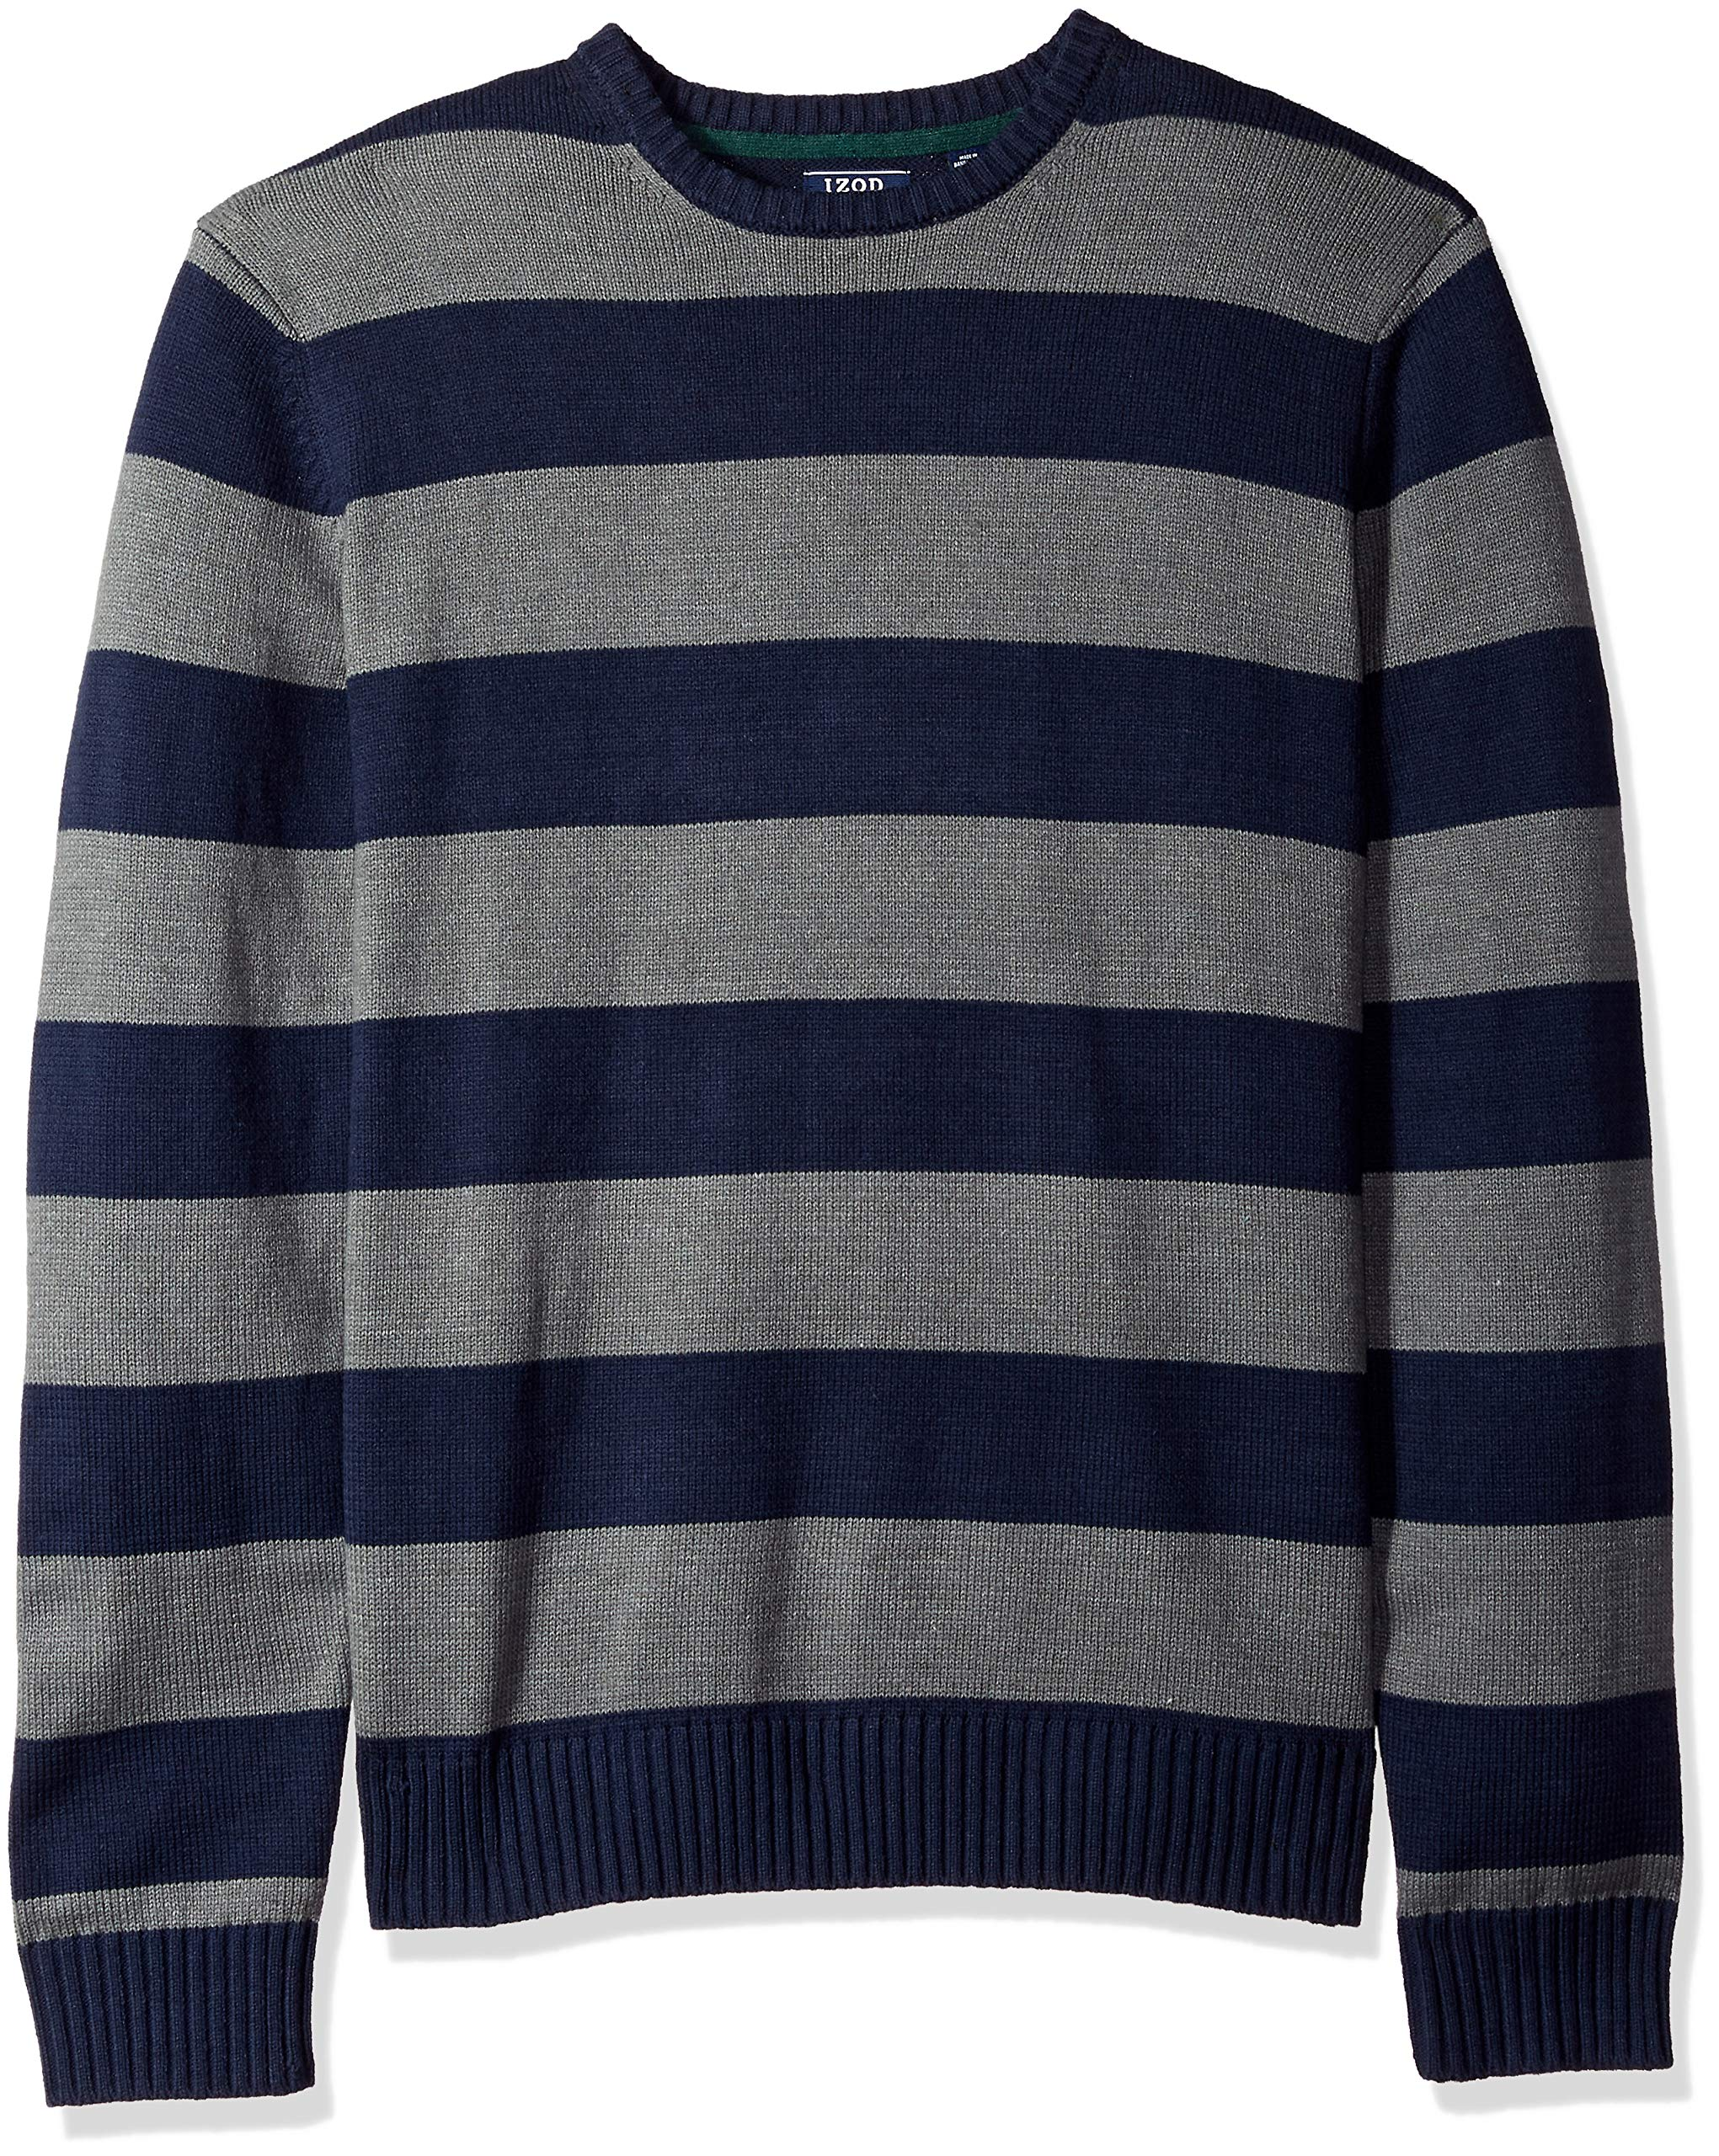 IZOD Men's Fine Gauge Crew Sweater, Rugby Peacoat, Large